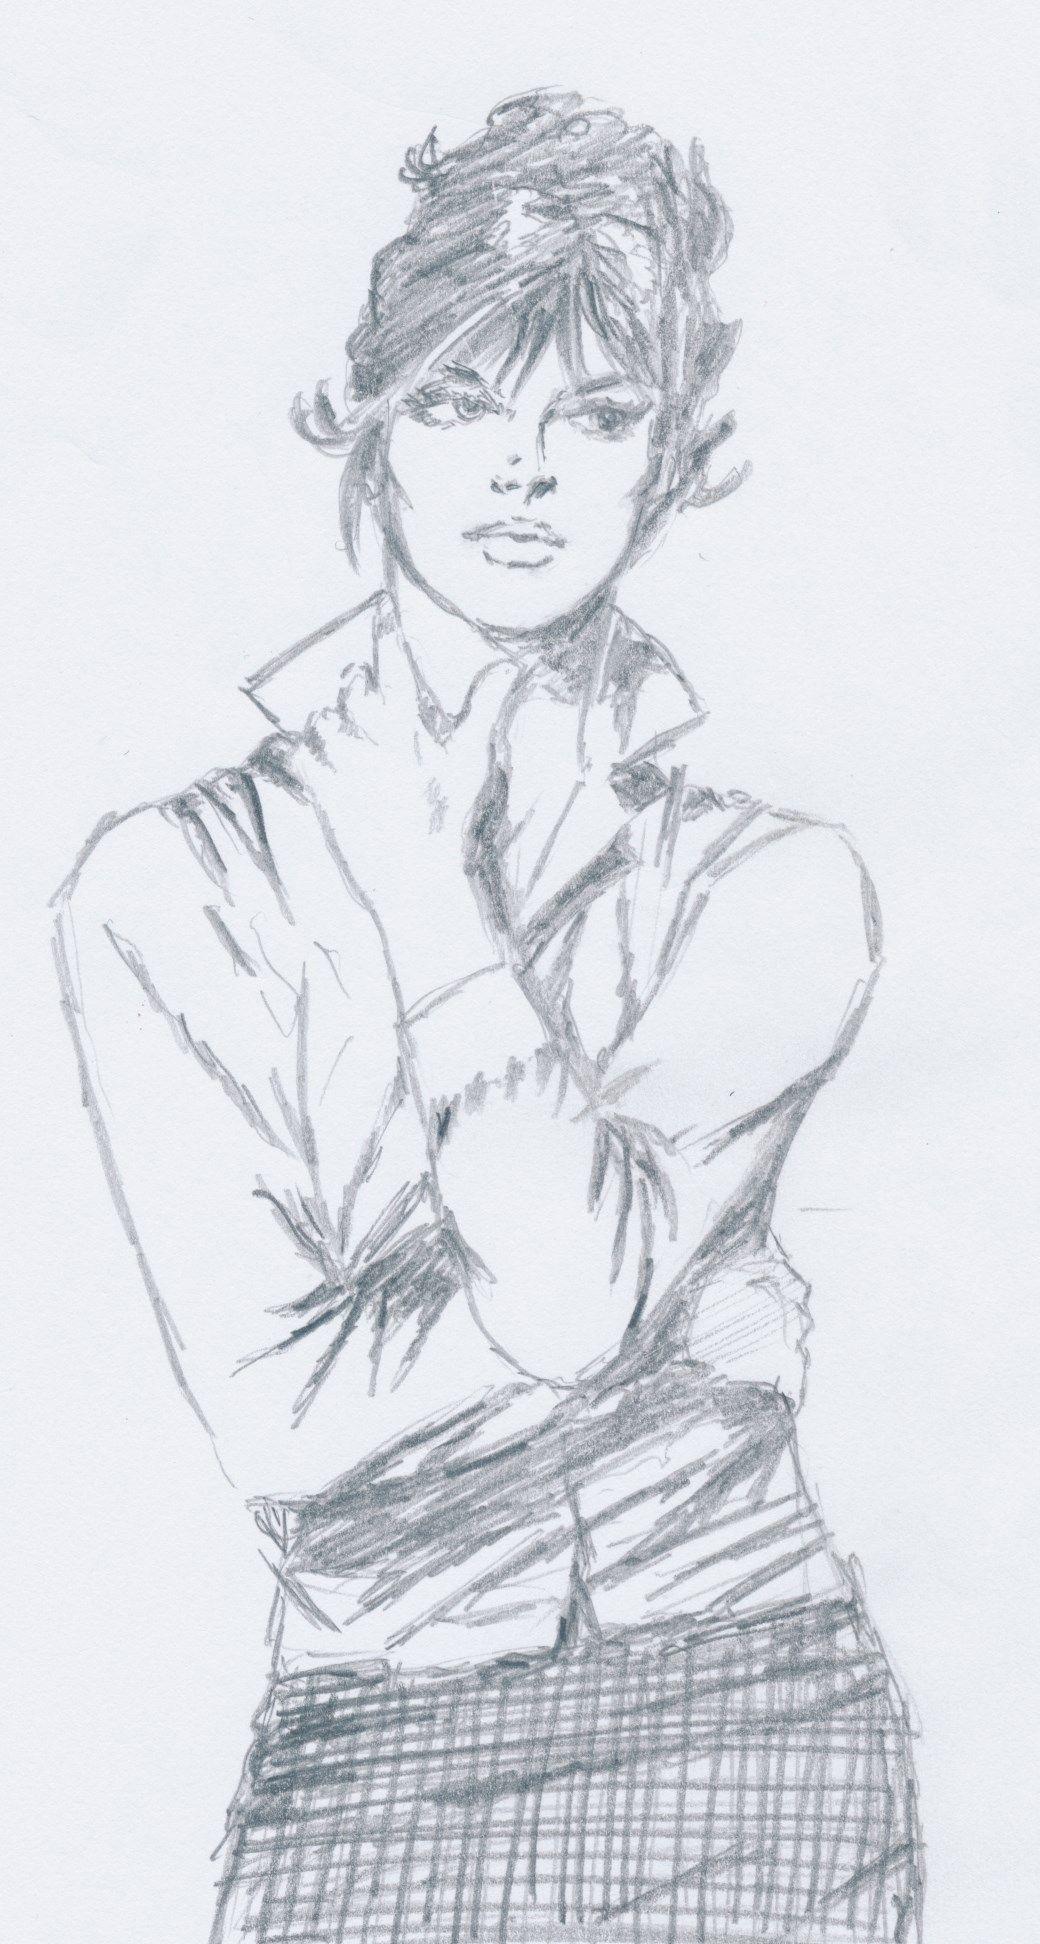 Modesty Blaise Pencil Sketch Sketches Illustration Art Retro Art